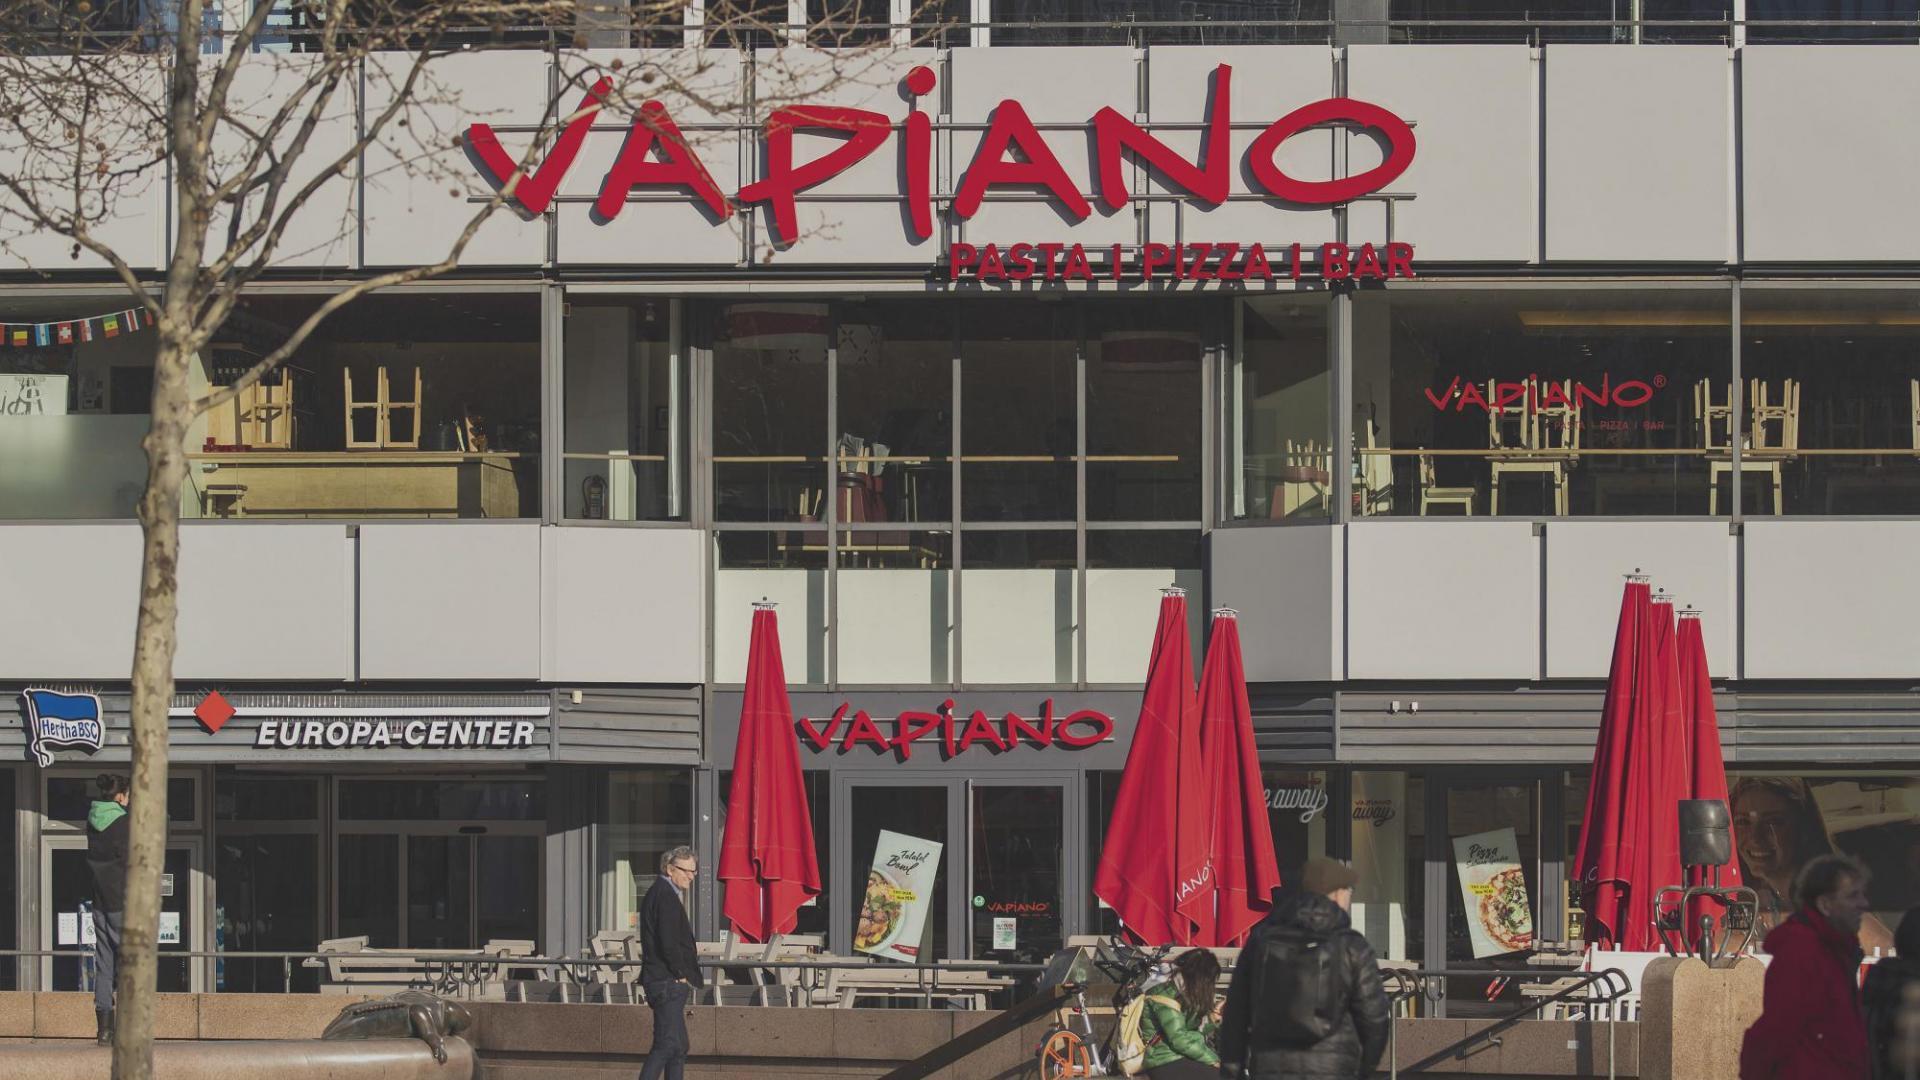 Restaurant Vapiano